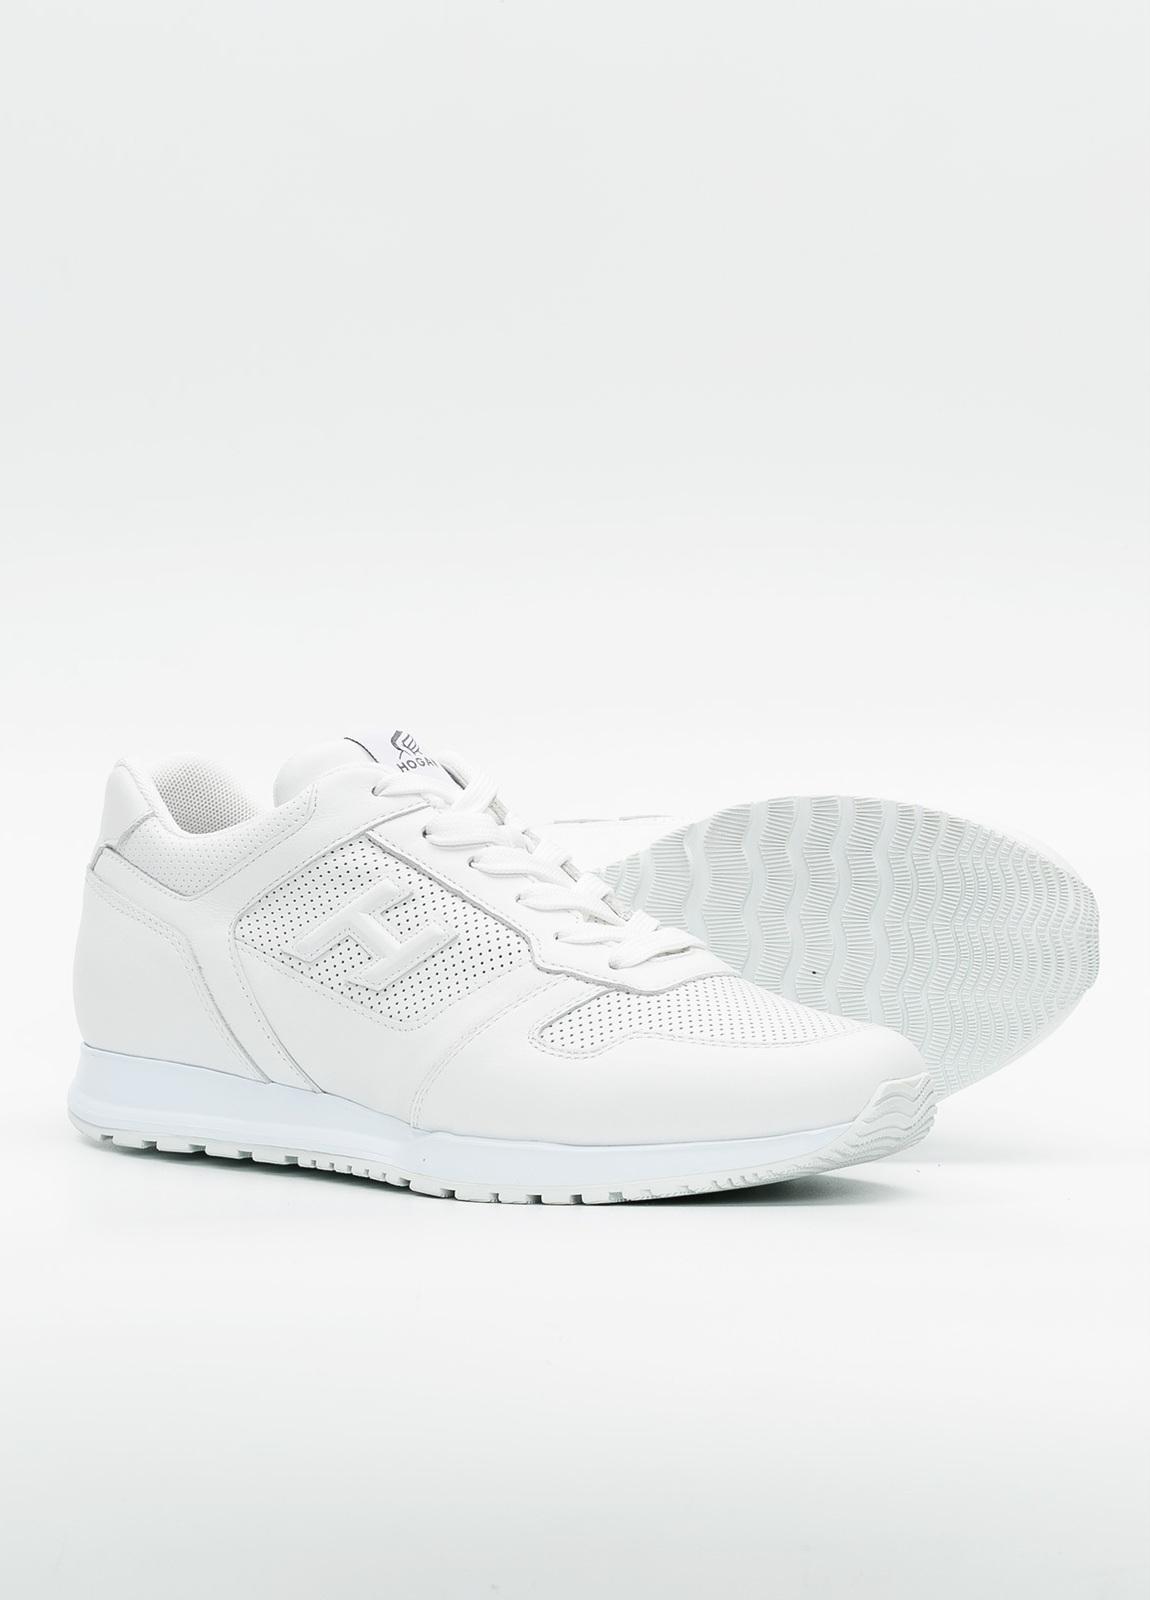 Calzado modelo OLIMPIA color blanco, 100% Piel. - Ítem2